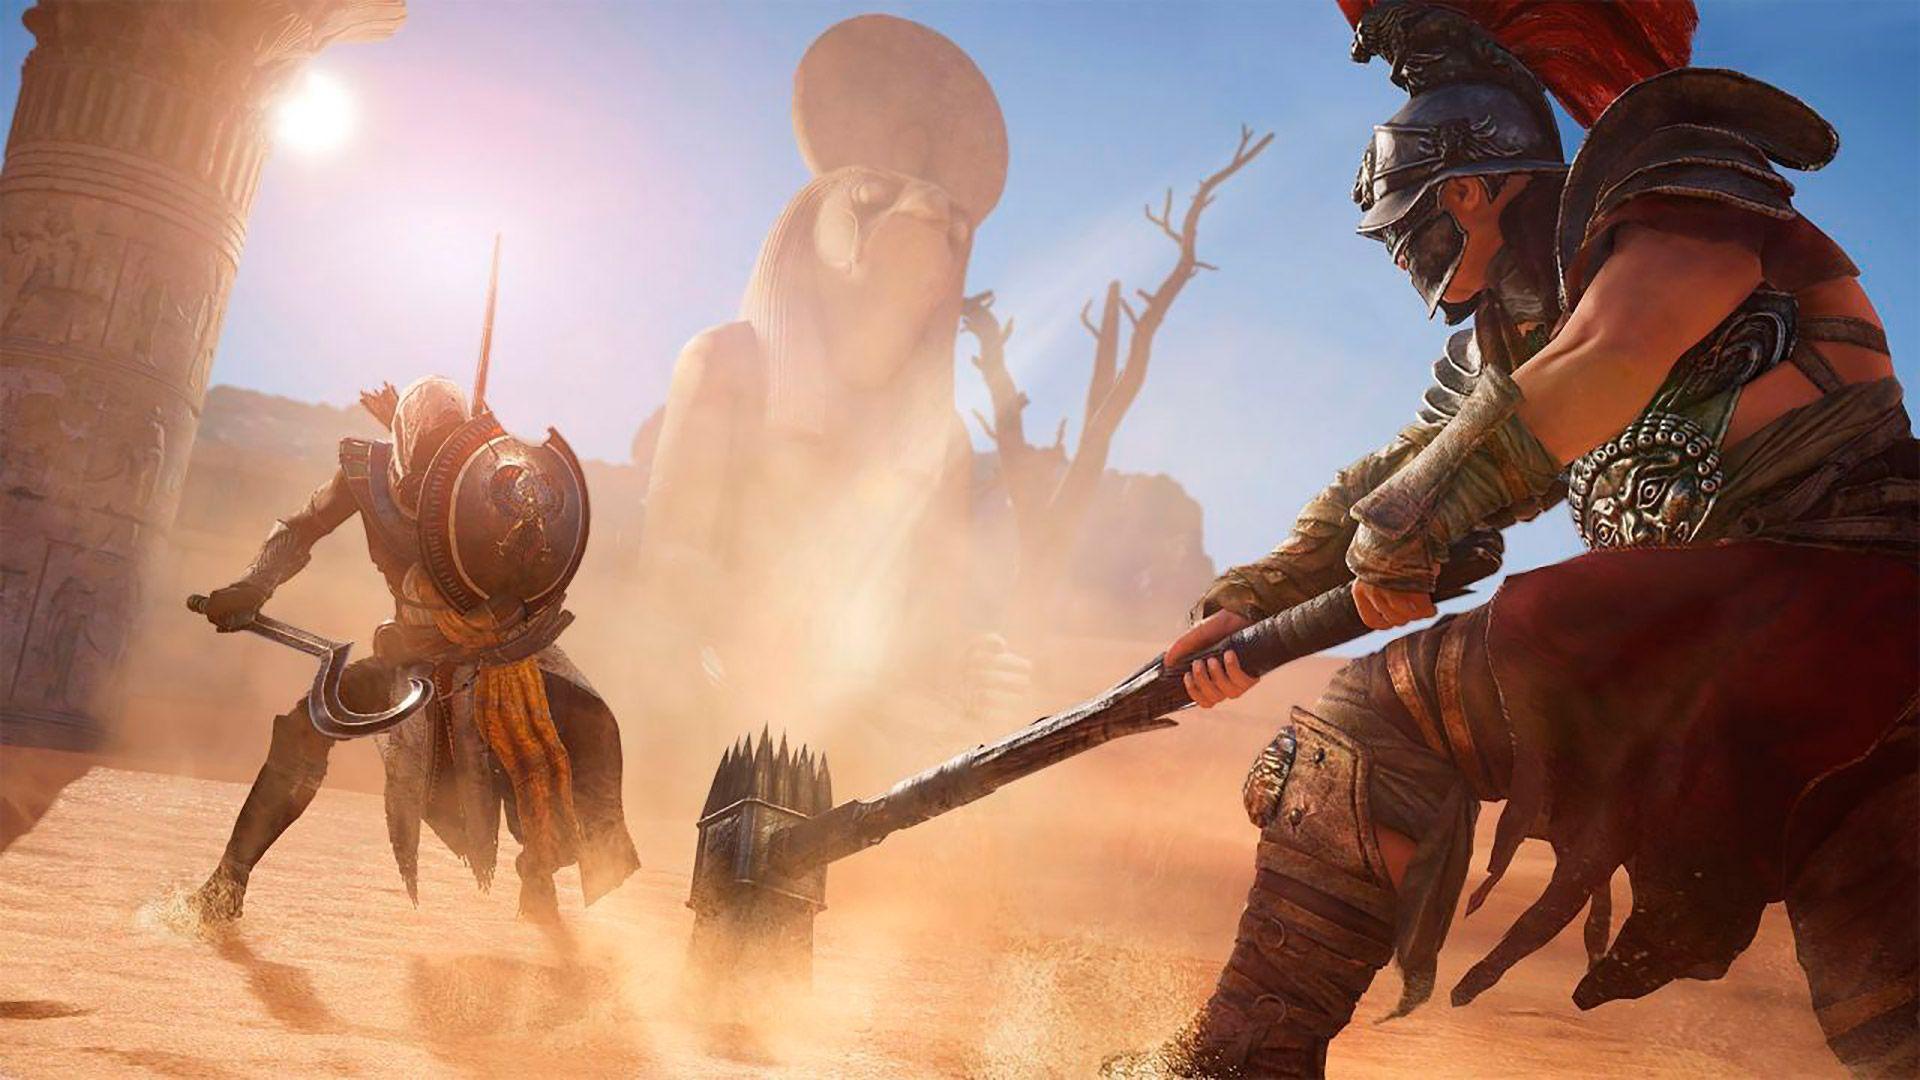 Assassin's Creed Истоки изображение 0